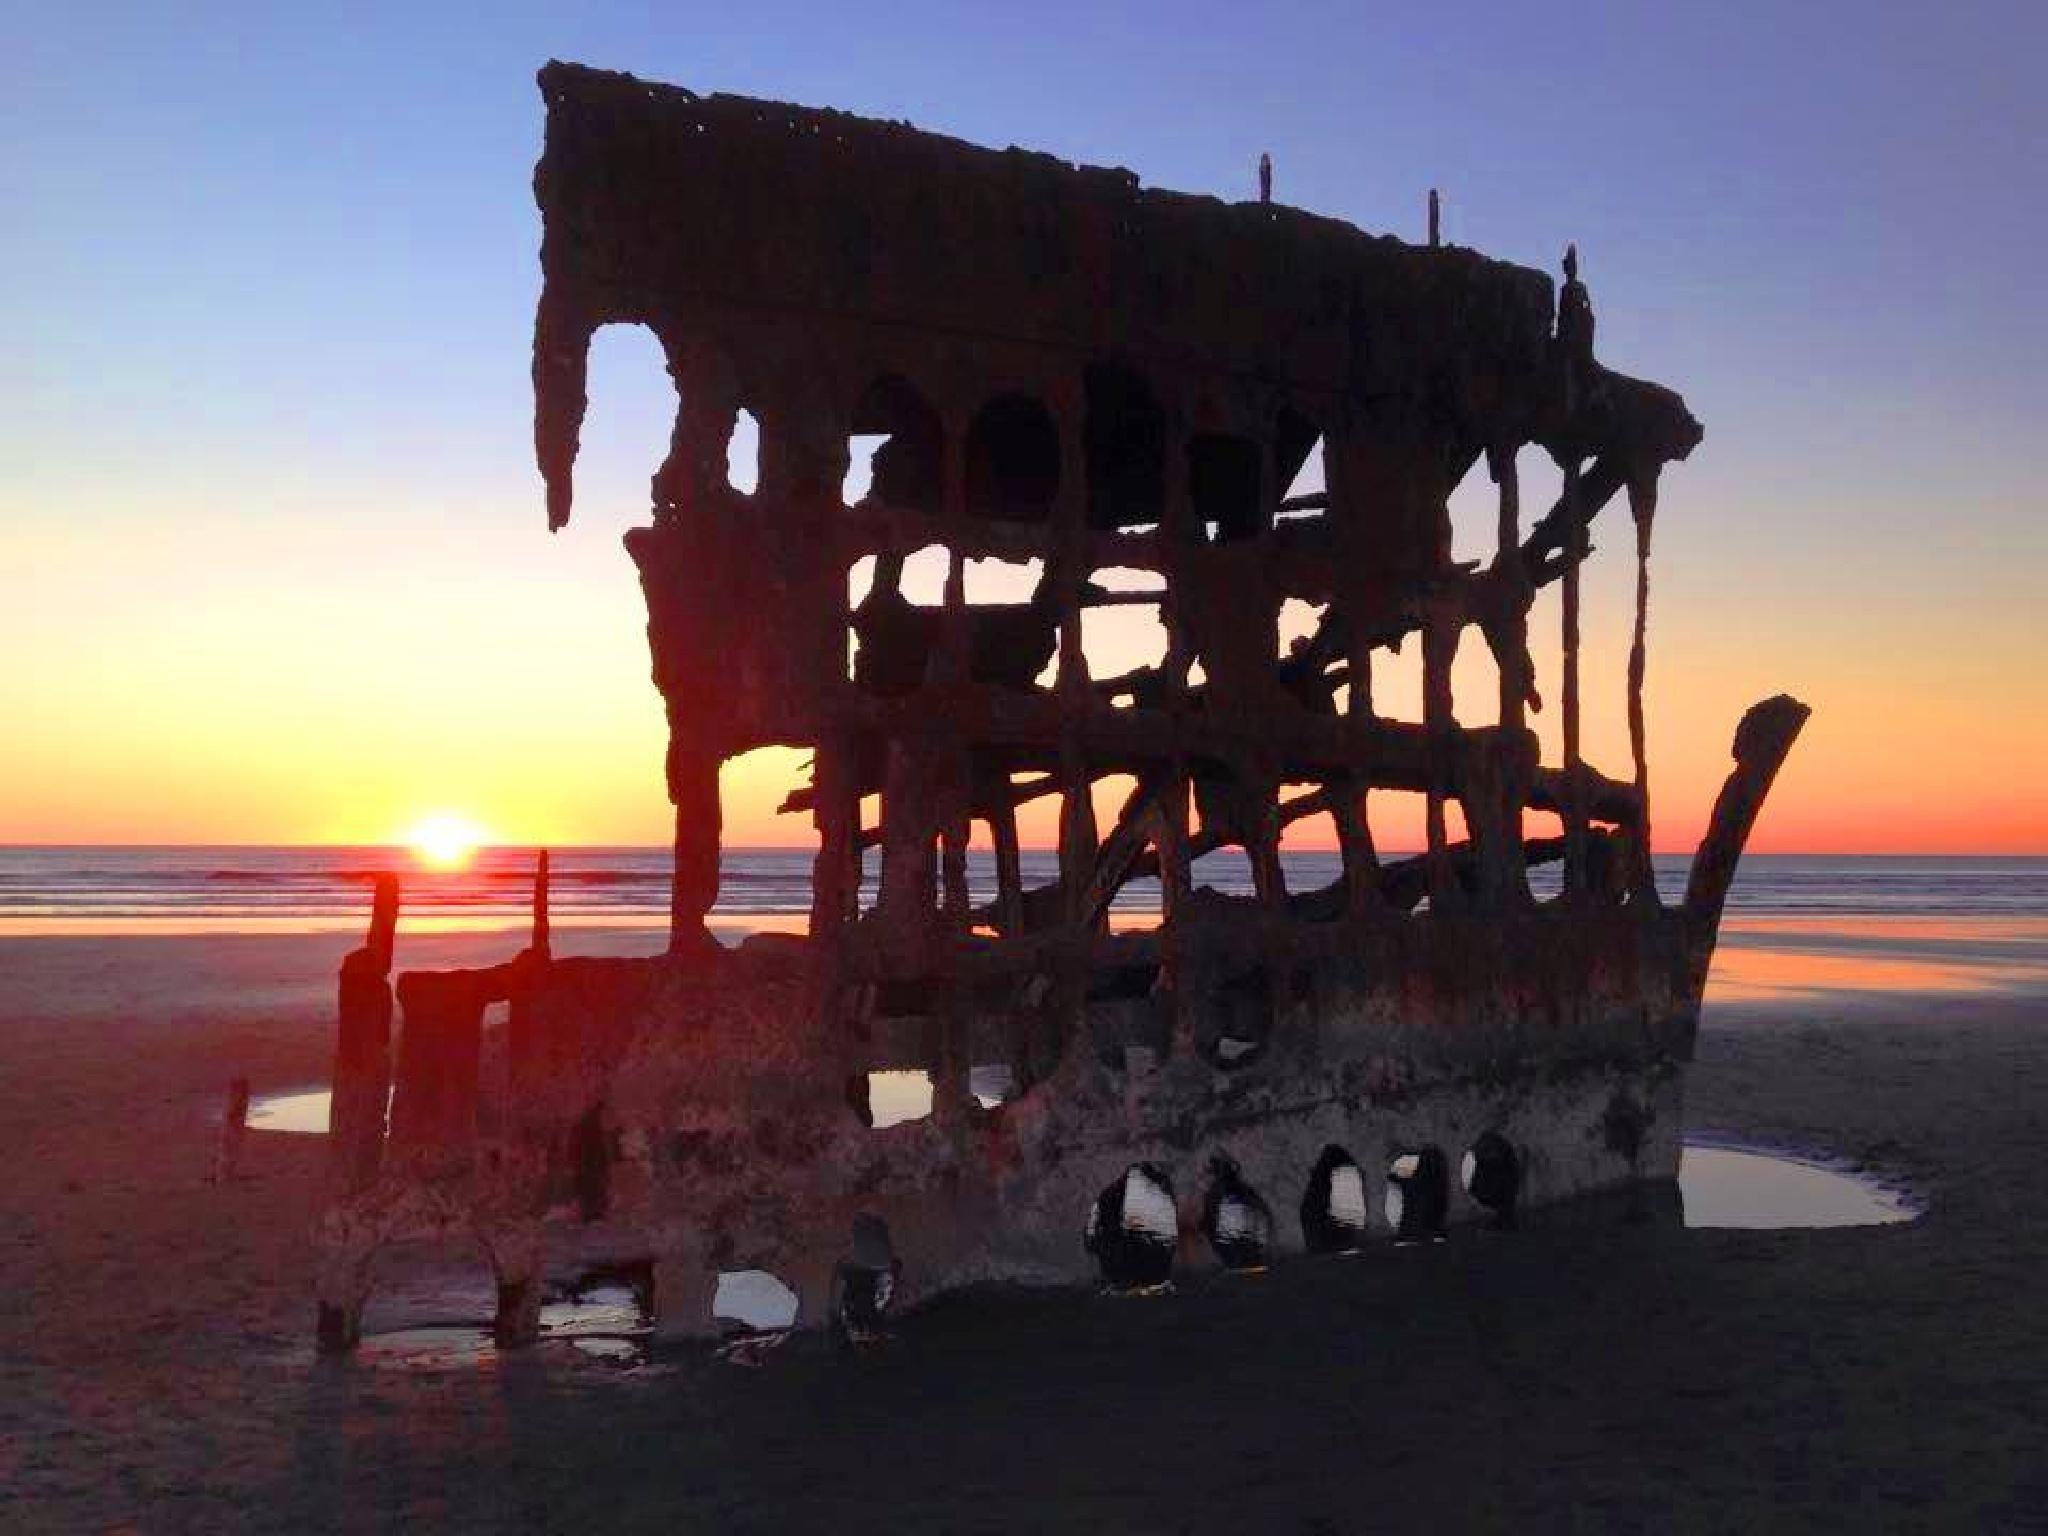 Shipwreck by RToton